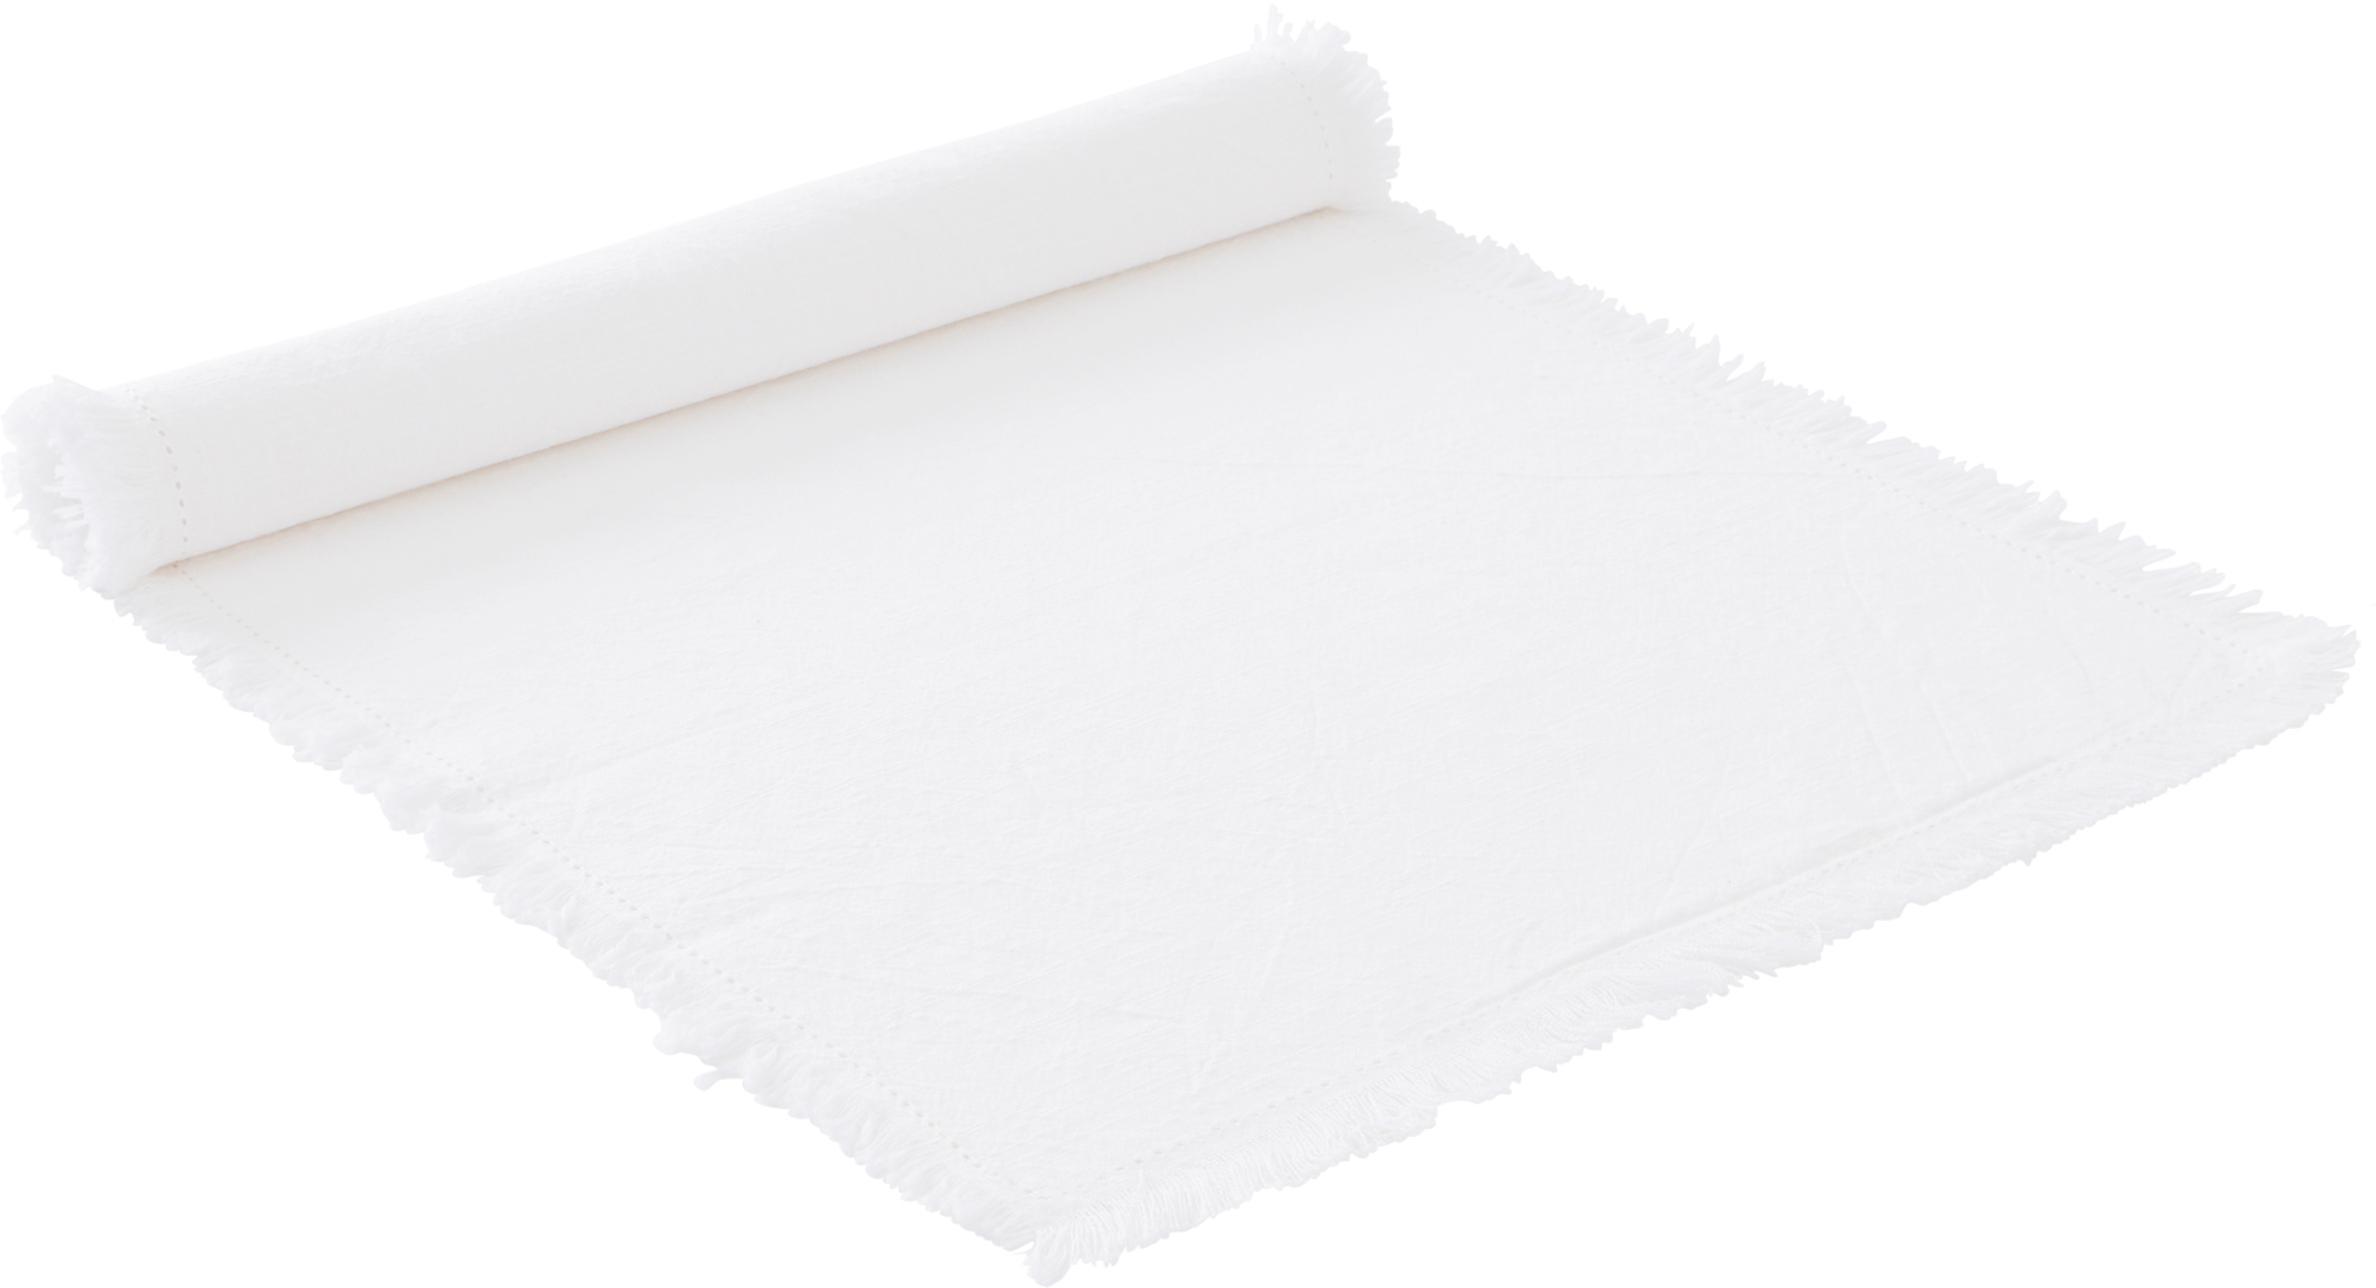 Bieżnik Hilma, 100% bawełna, Biały, D 40 x S 140 cm